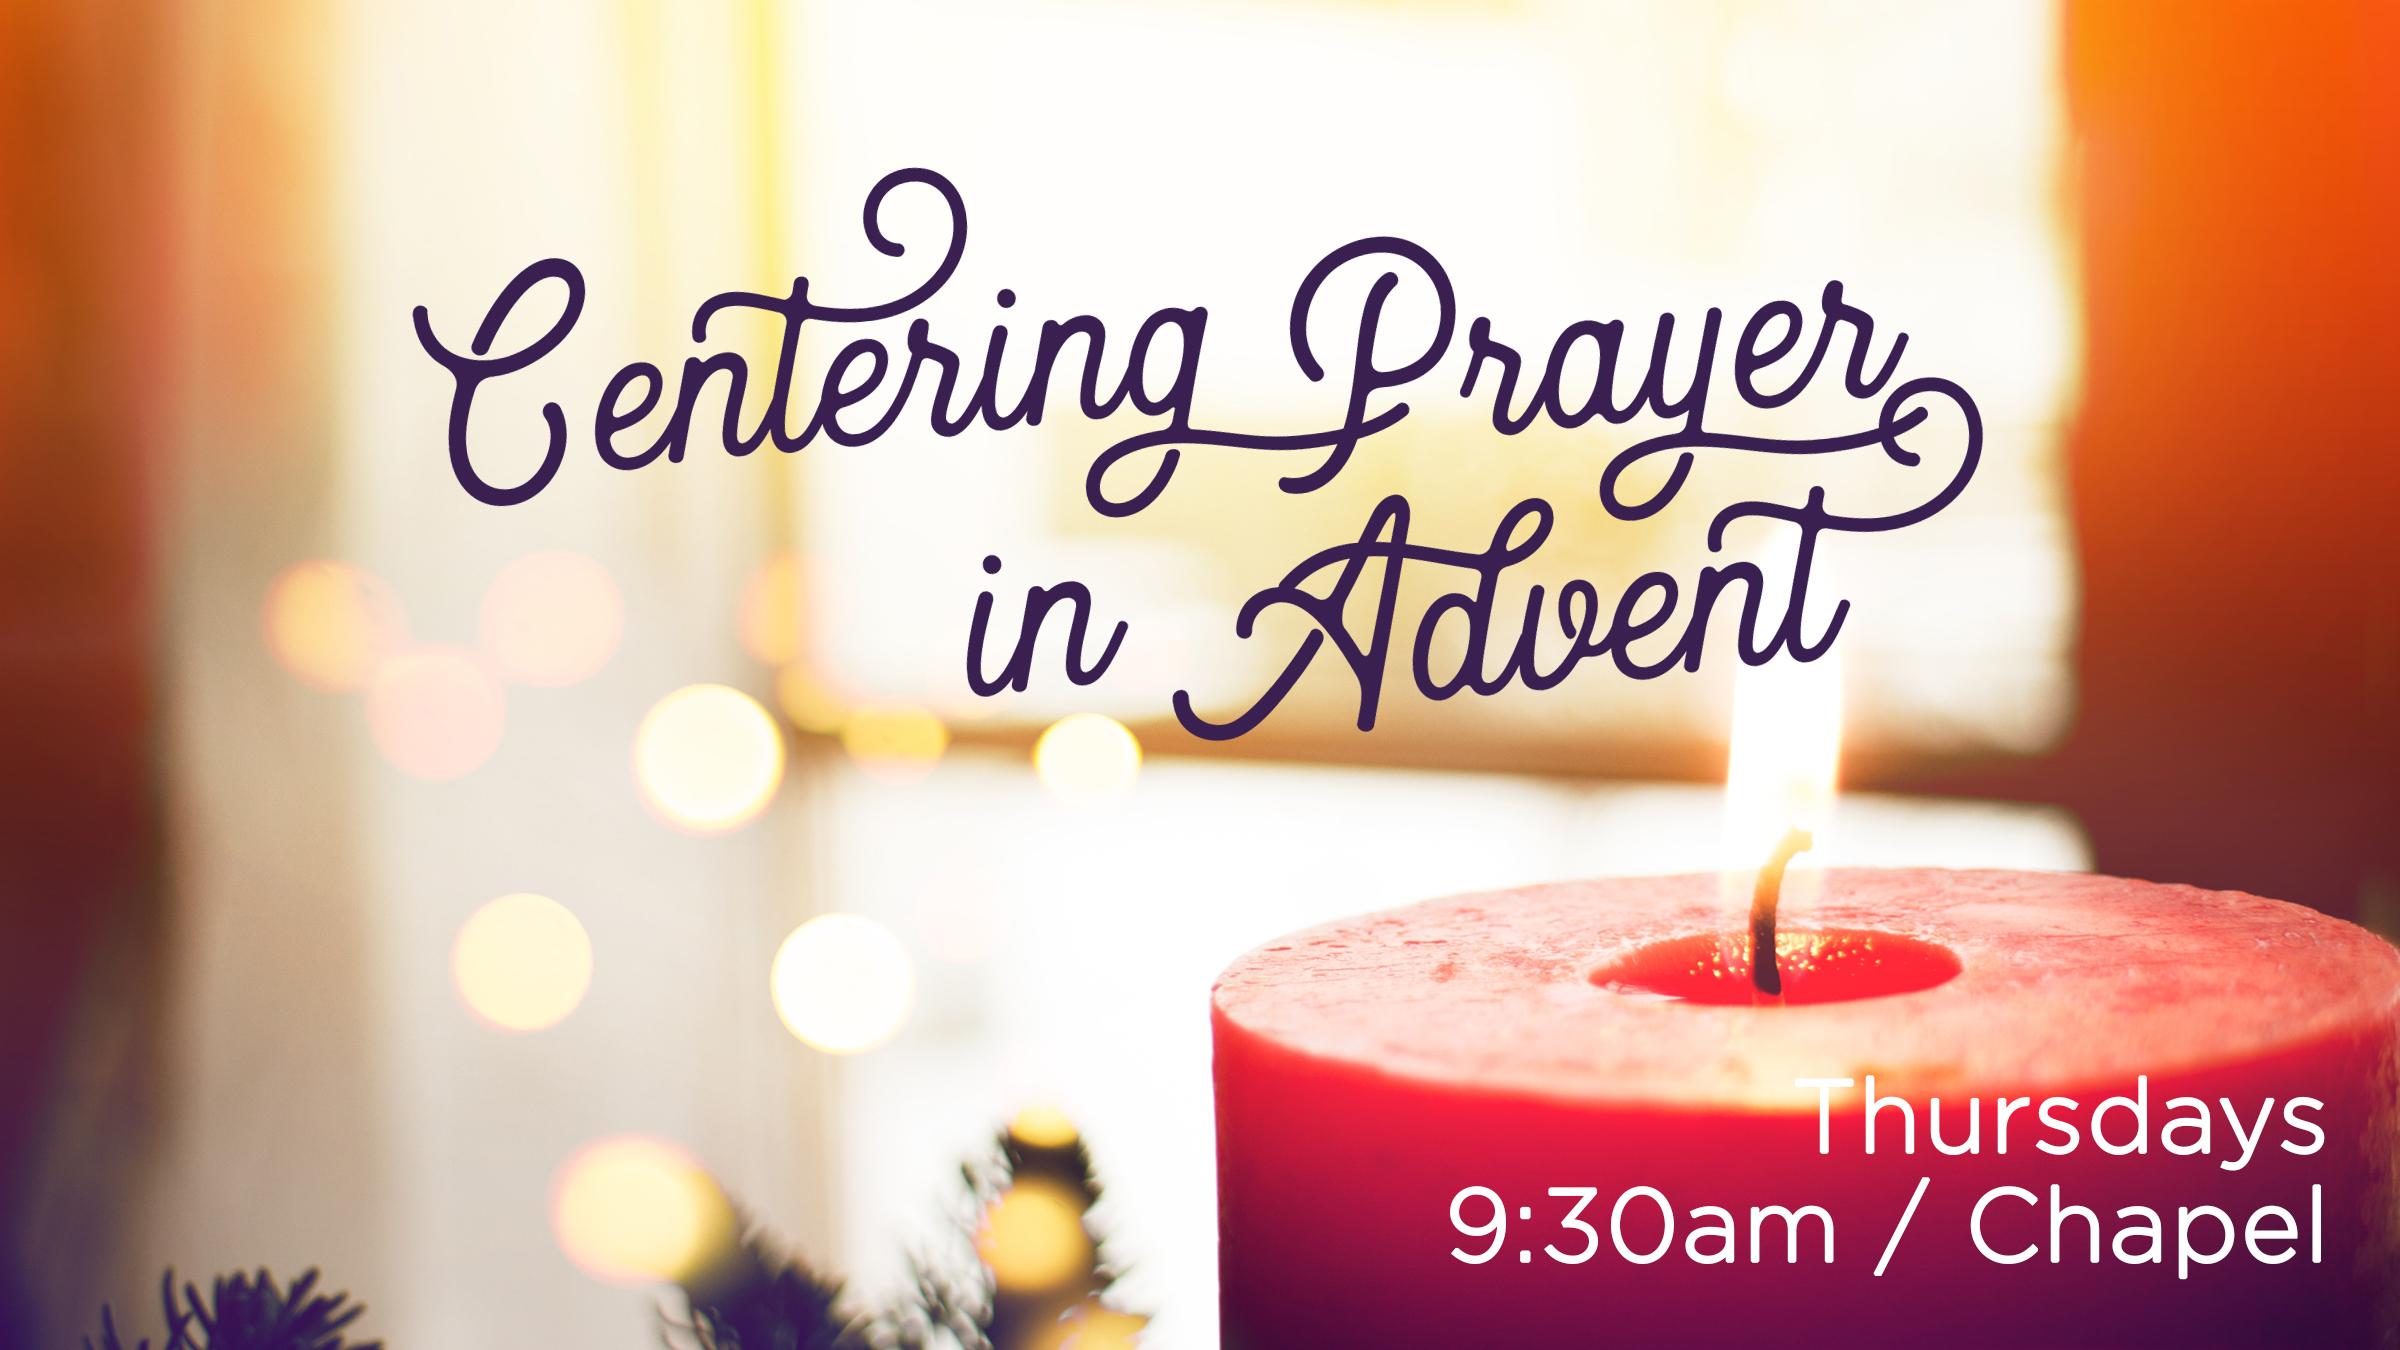 screen_Centering-Prayer-in-Advent.jpg